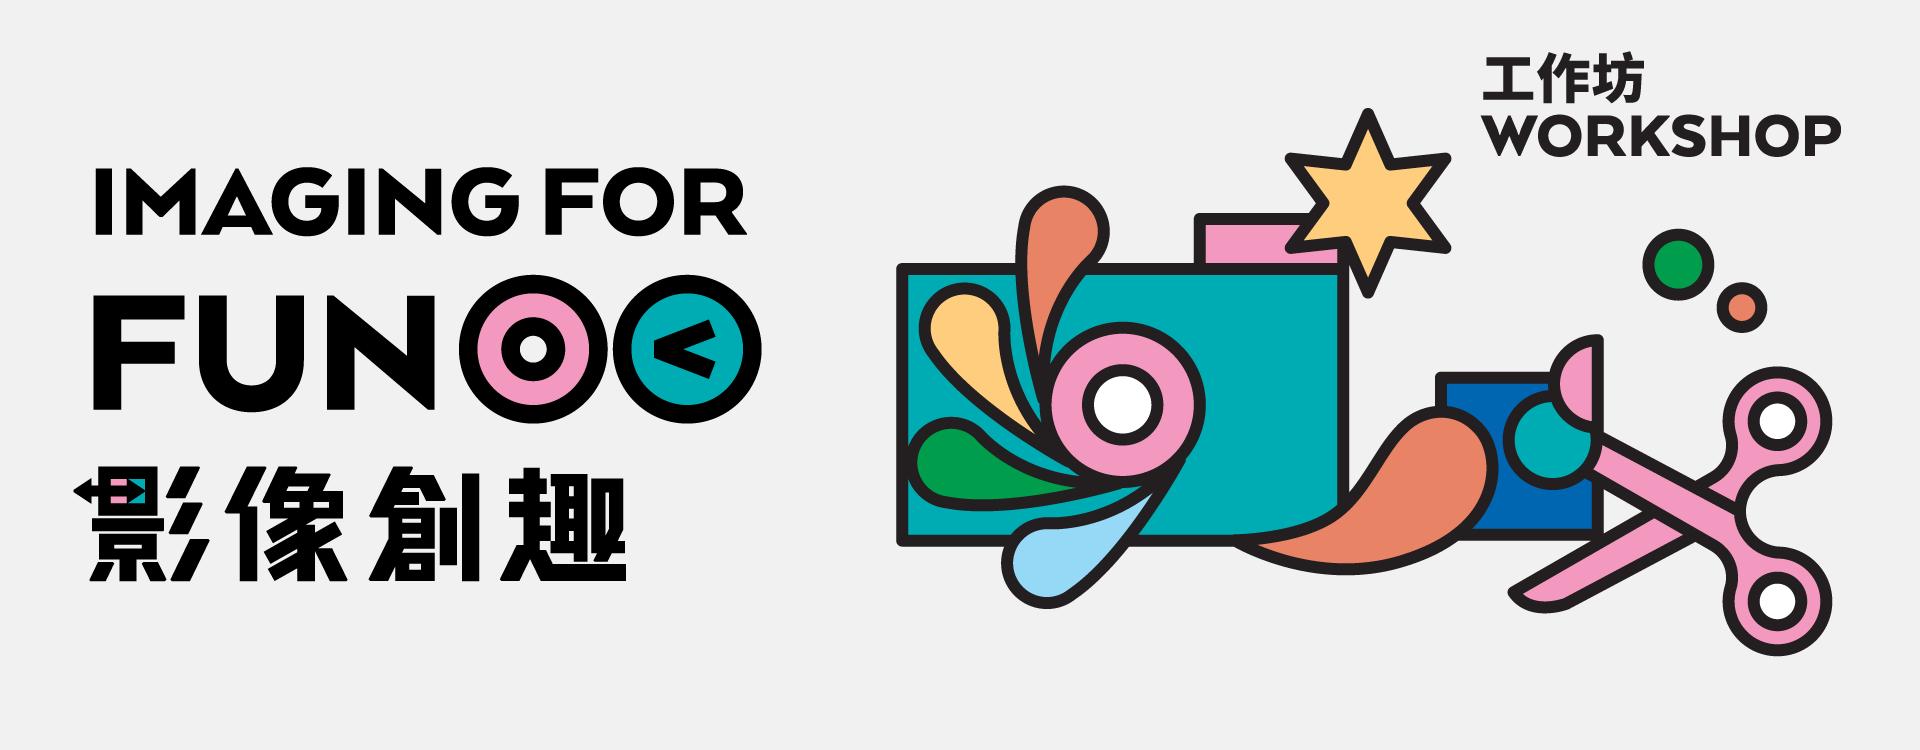 Imaging For Fun Workshop Web Banner